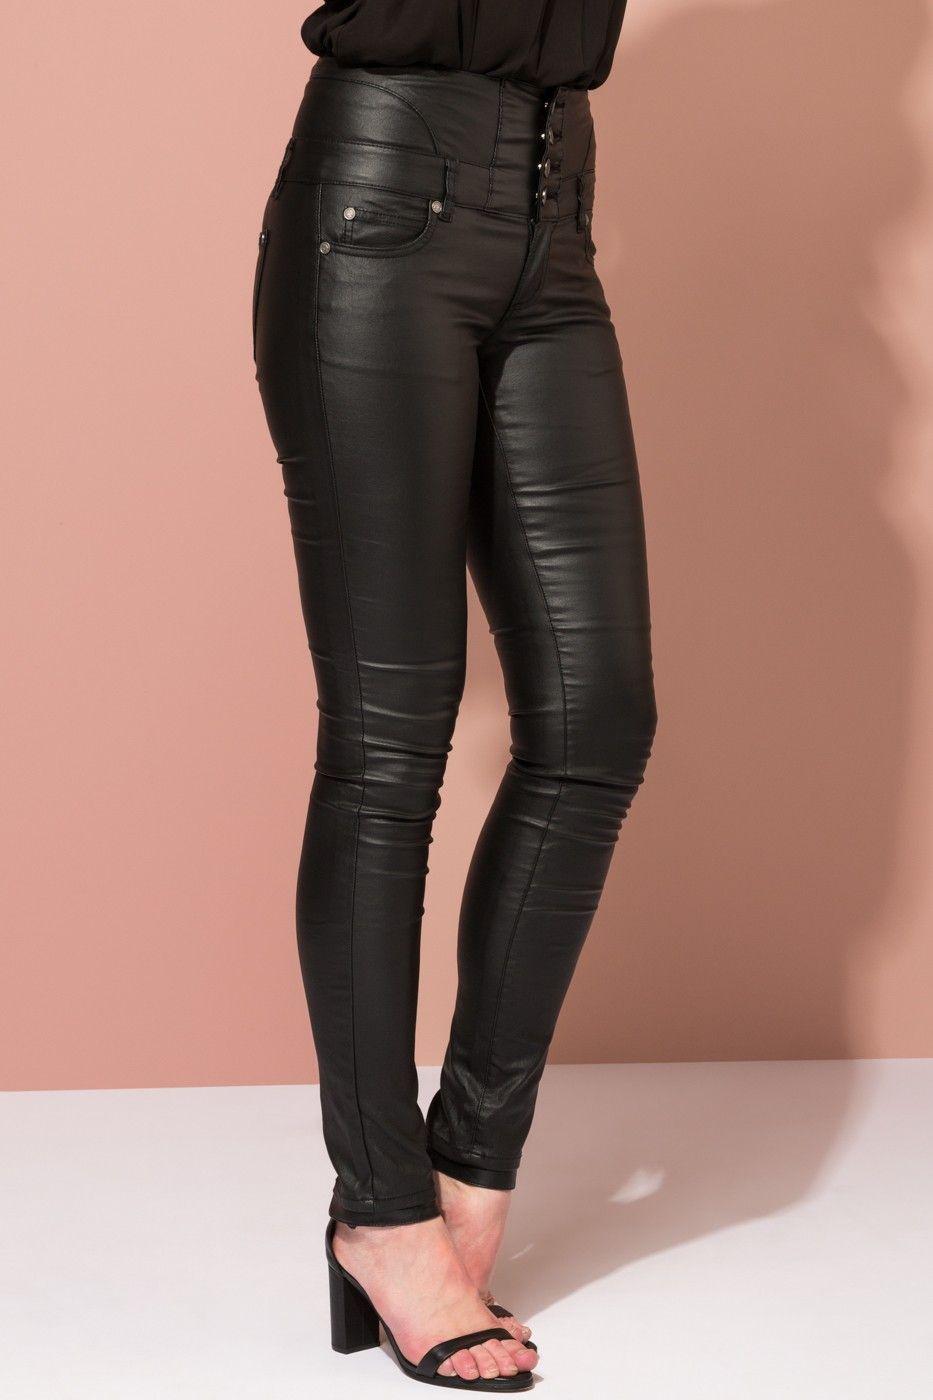 3c37ad41a Floyd by Smith Angelina 513 bukse svart skinnbukser til dame - Floyd ...